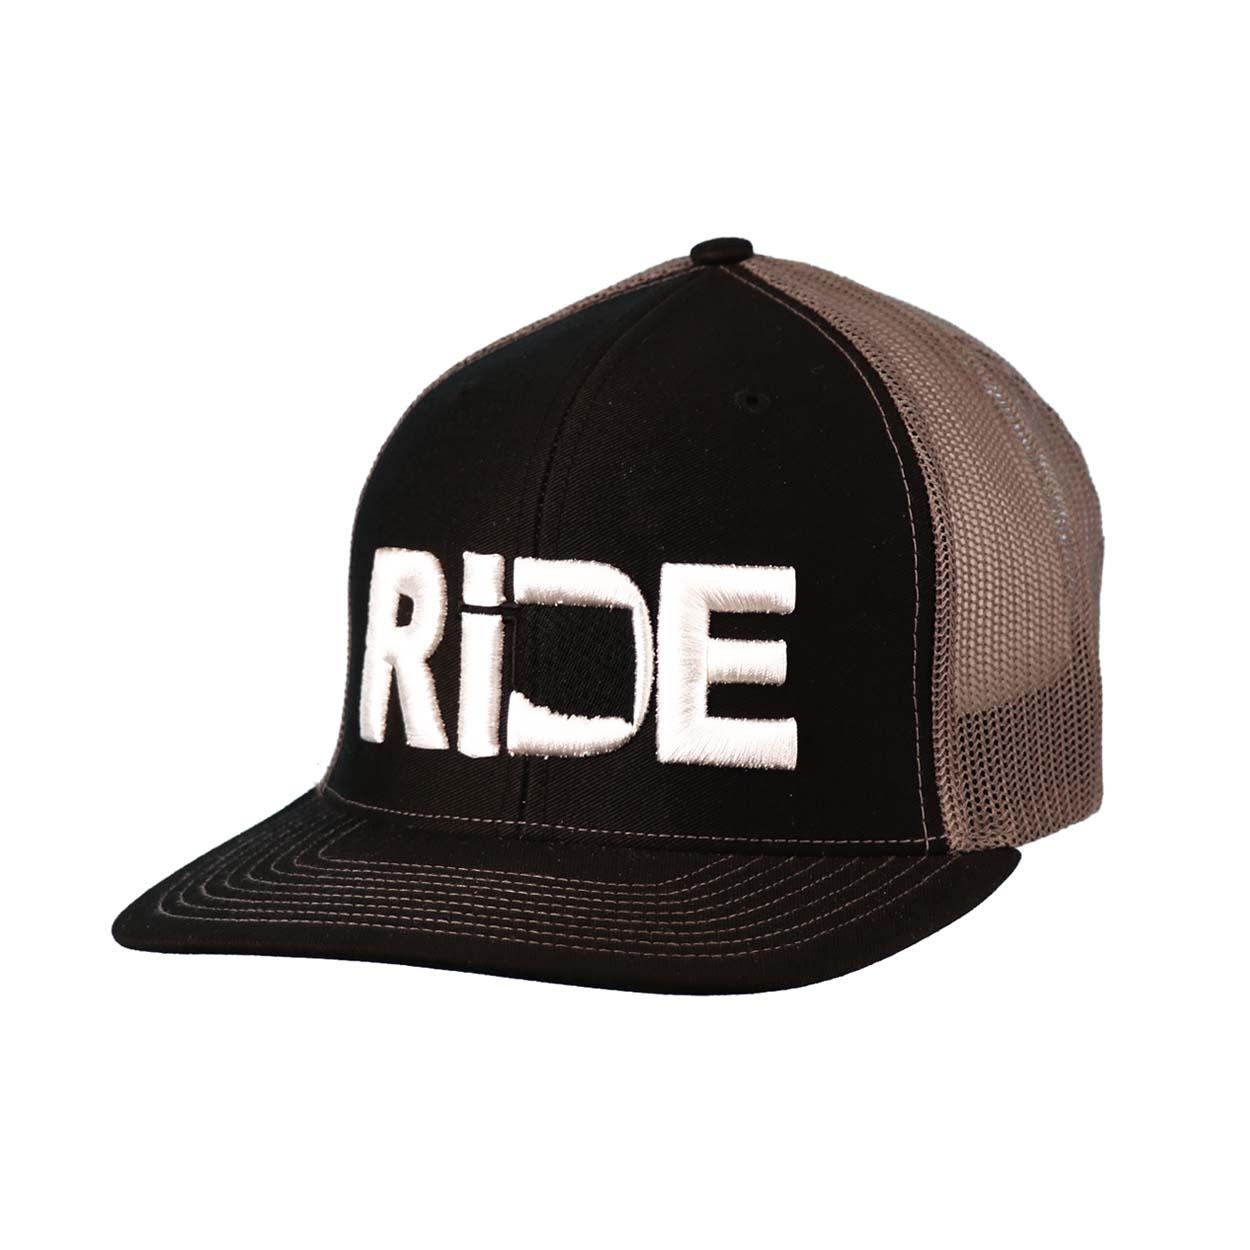 Ride Oklahoma Classic Embroidered Snapback Trucker Hat Black/White